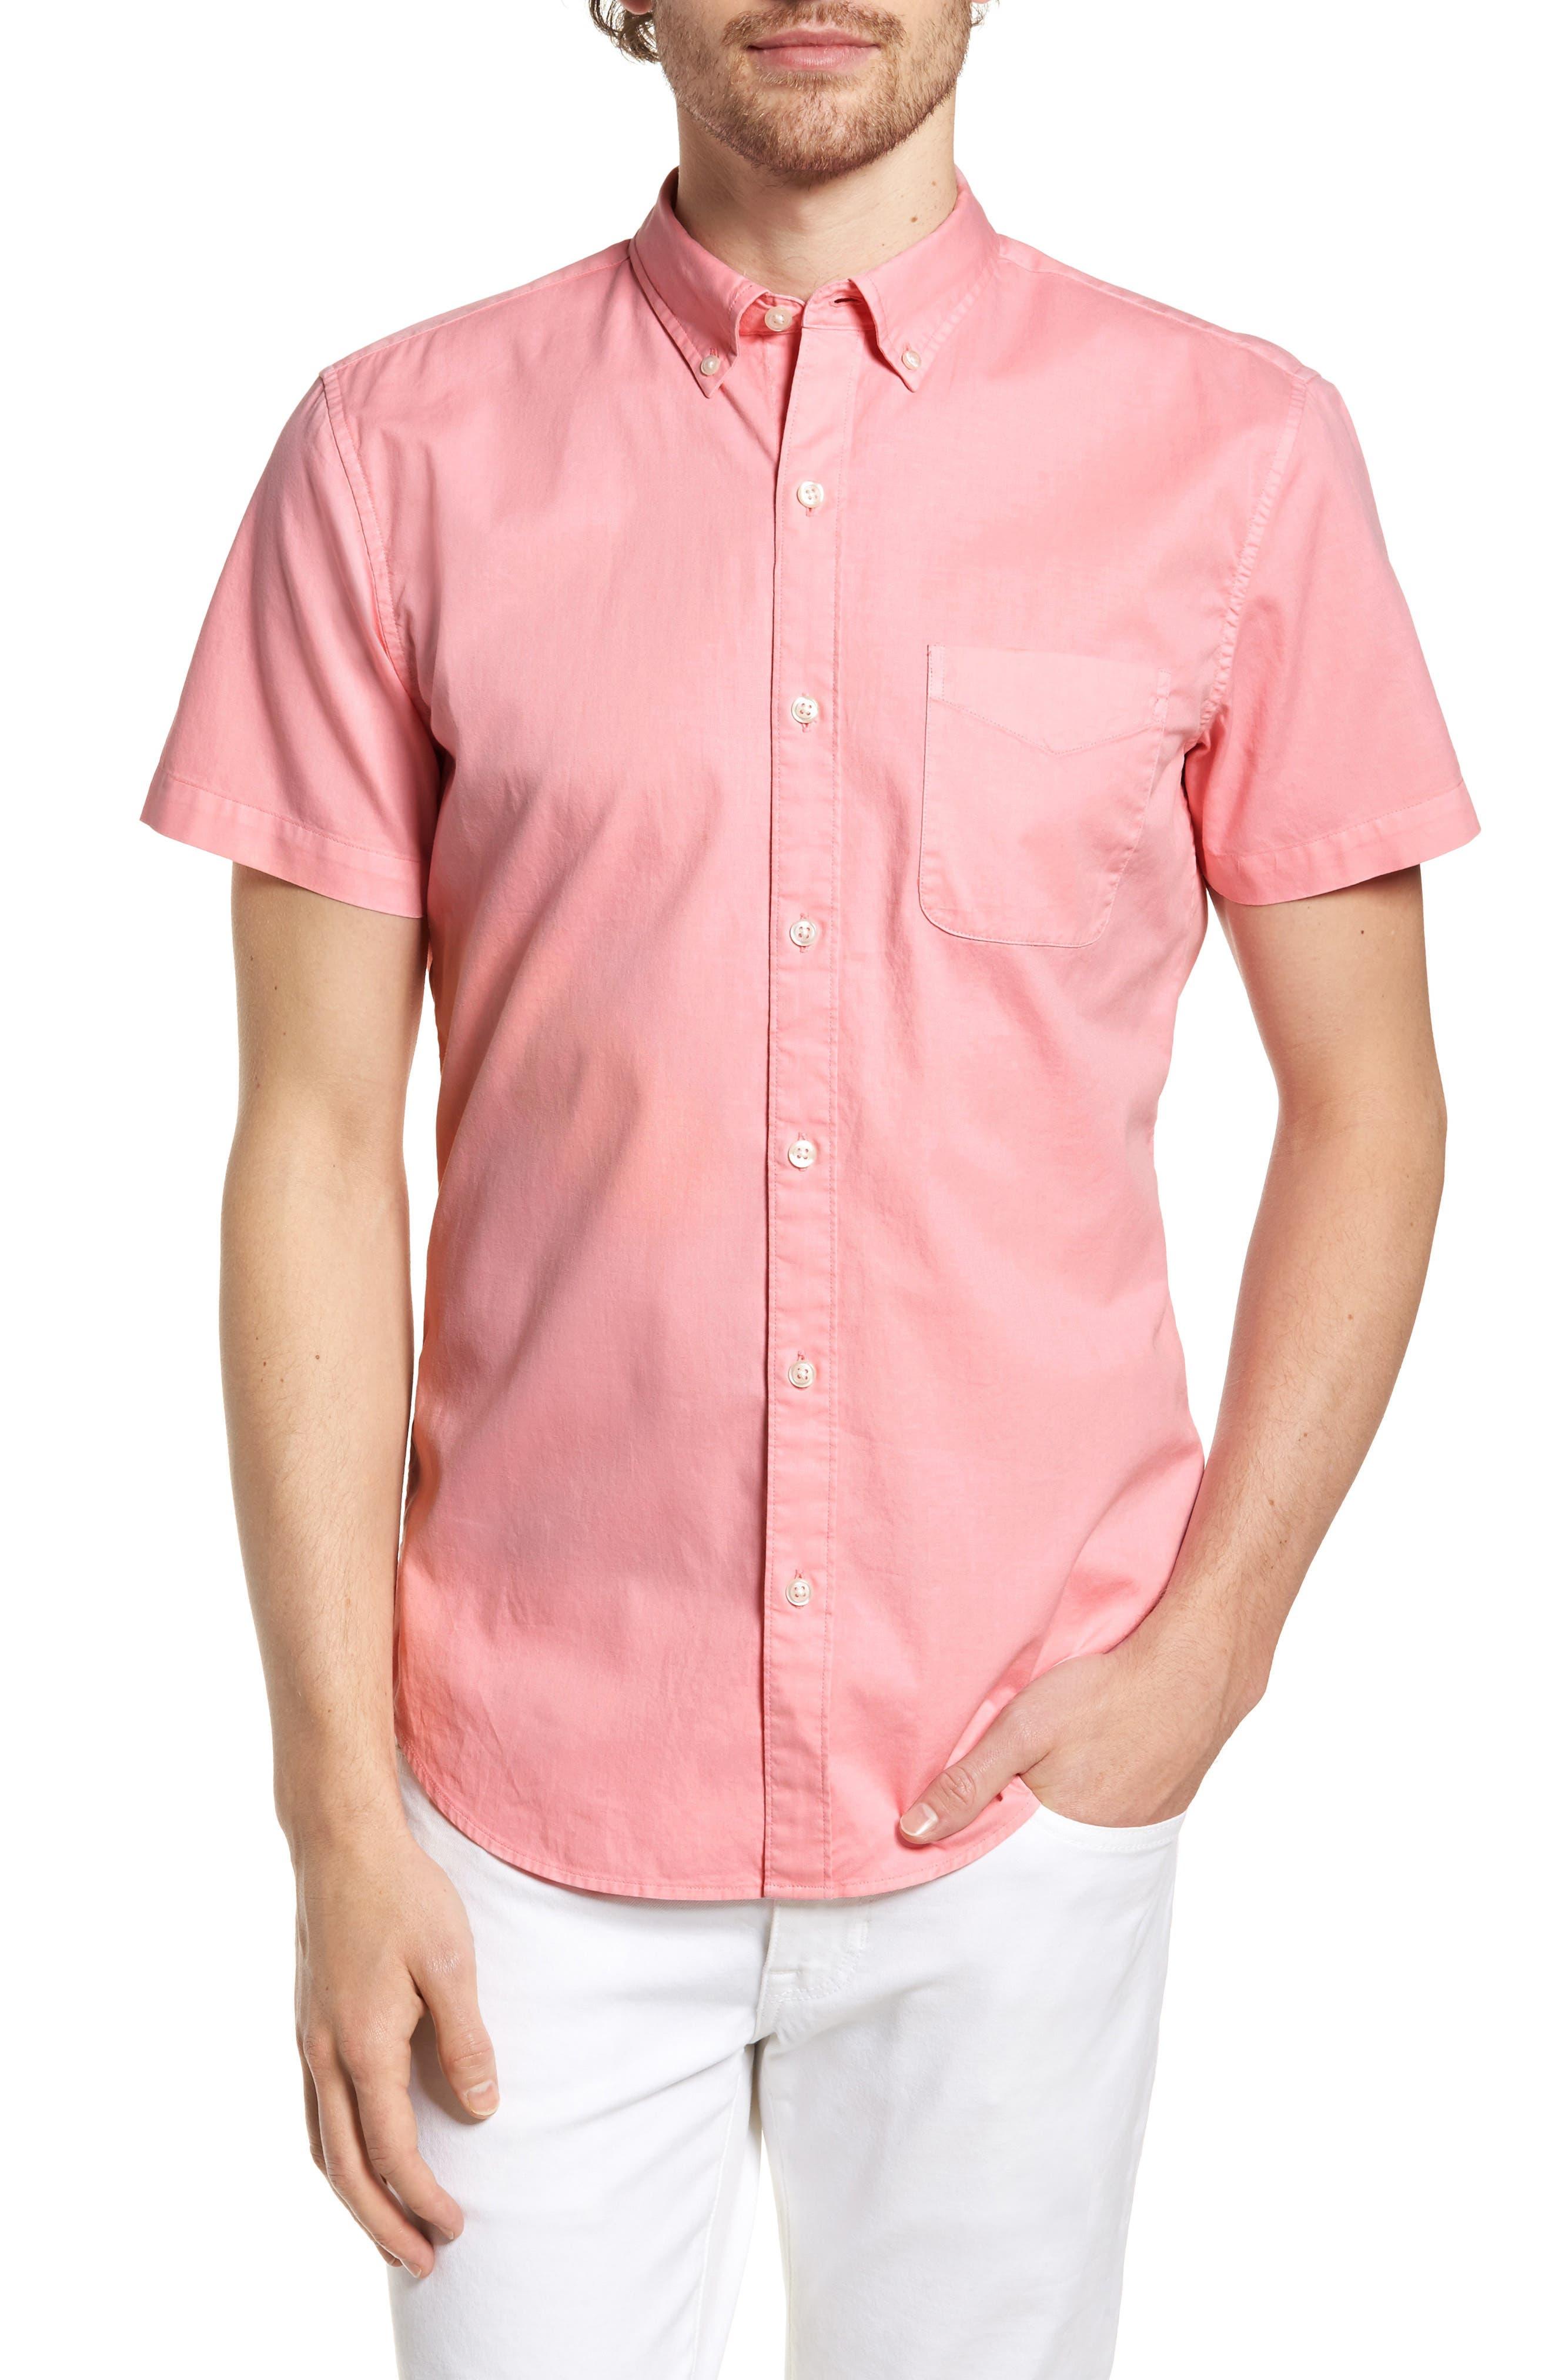 Slim Fit Short Sleeve Sport Shirt,                             Main thumbnail 1, color,                             Garment Dye - Pacific Pink